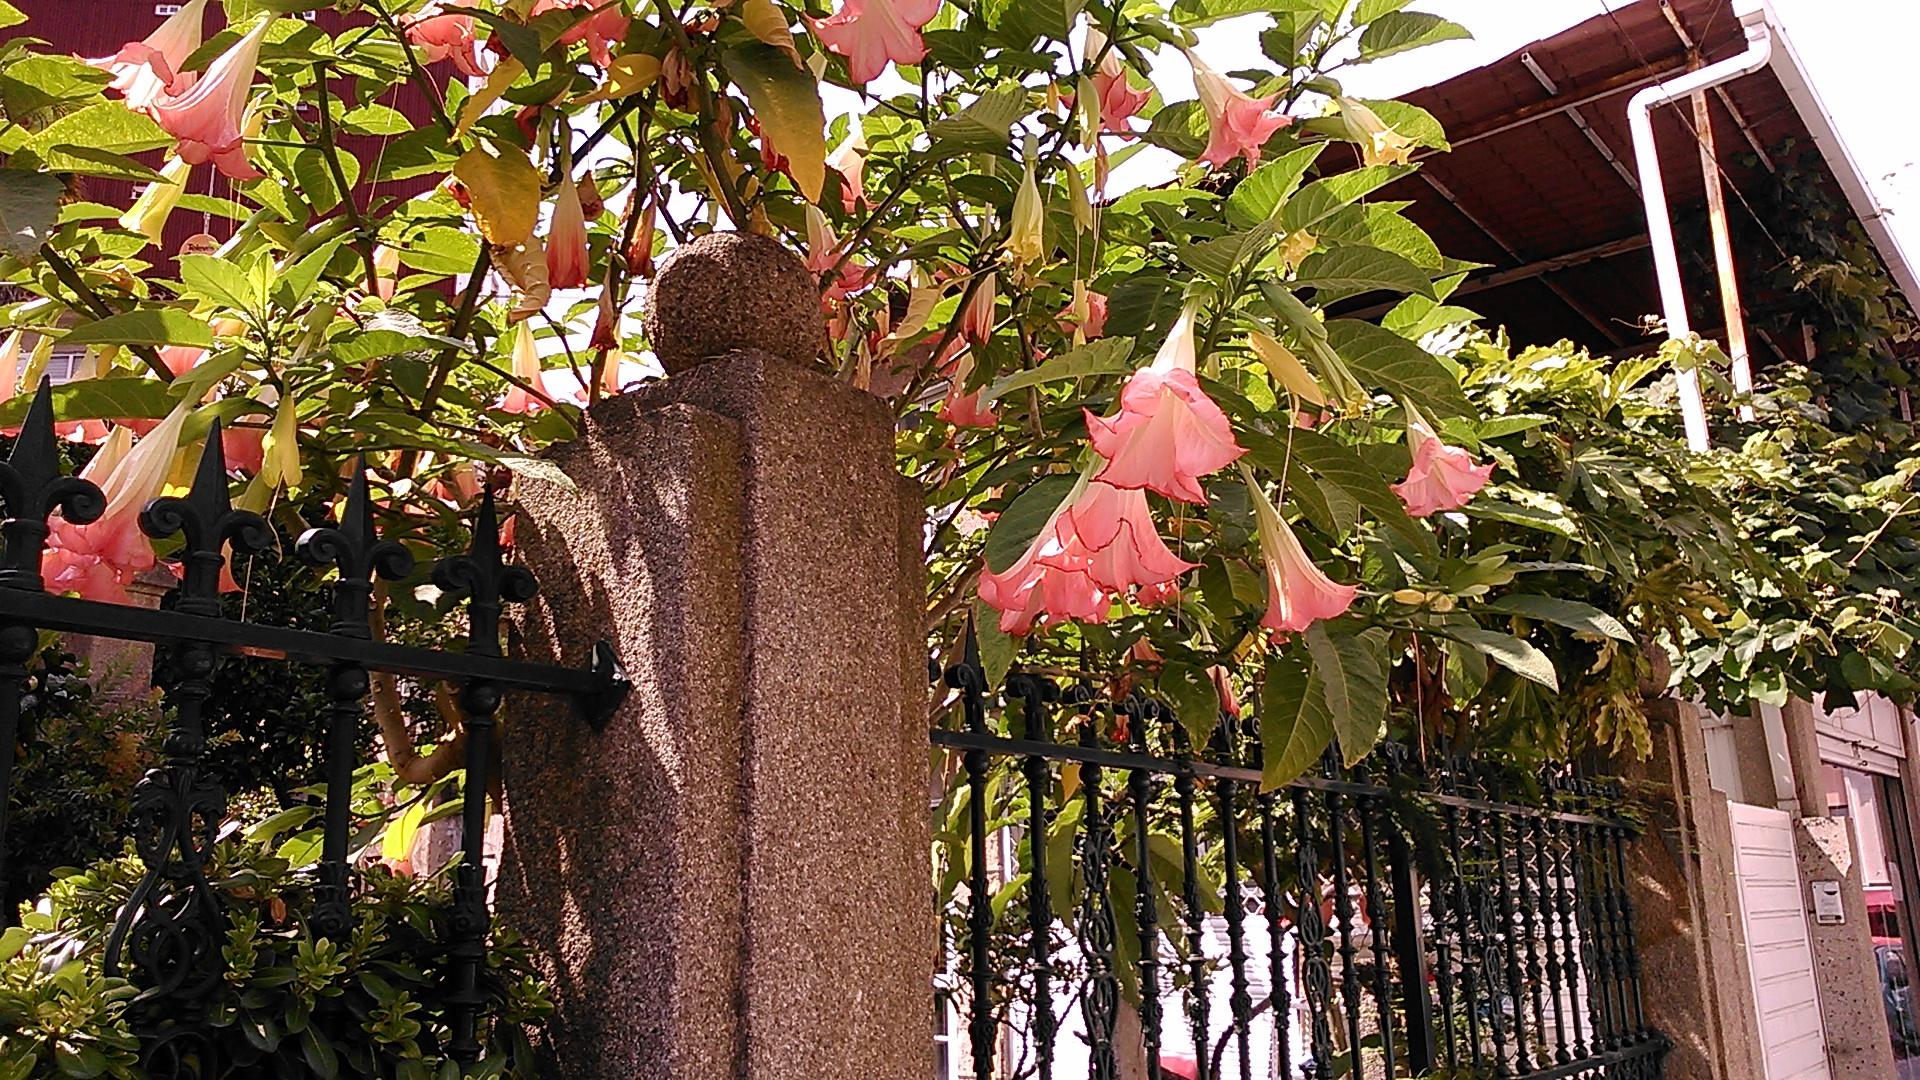 https://upload.wikimedia.org/wikipedia/commons/0/02/Brugmansia_suaveolens._Vigo.jpg